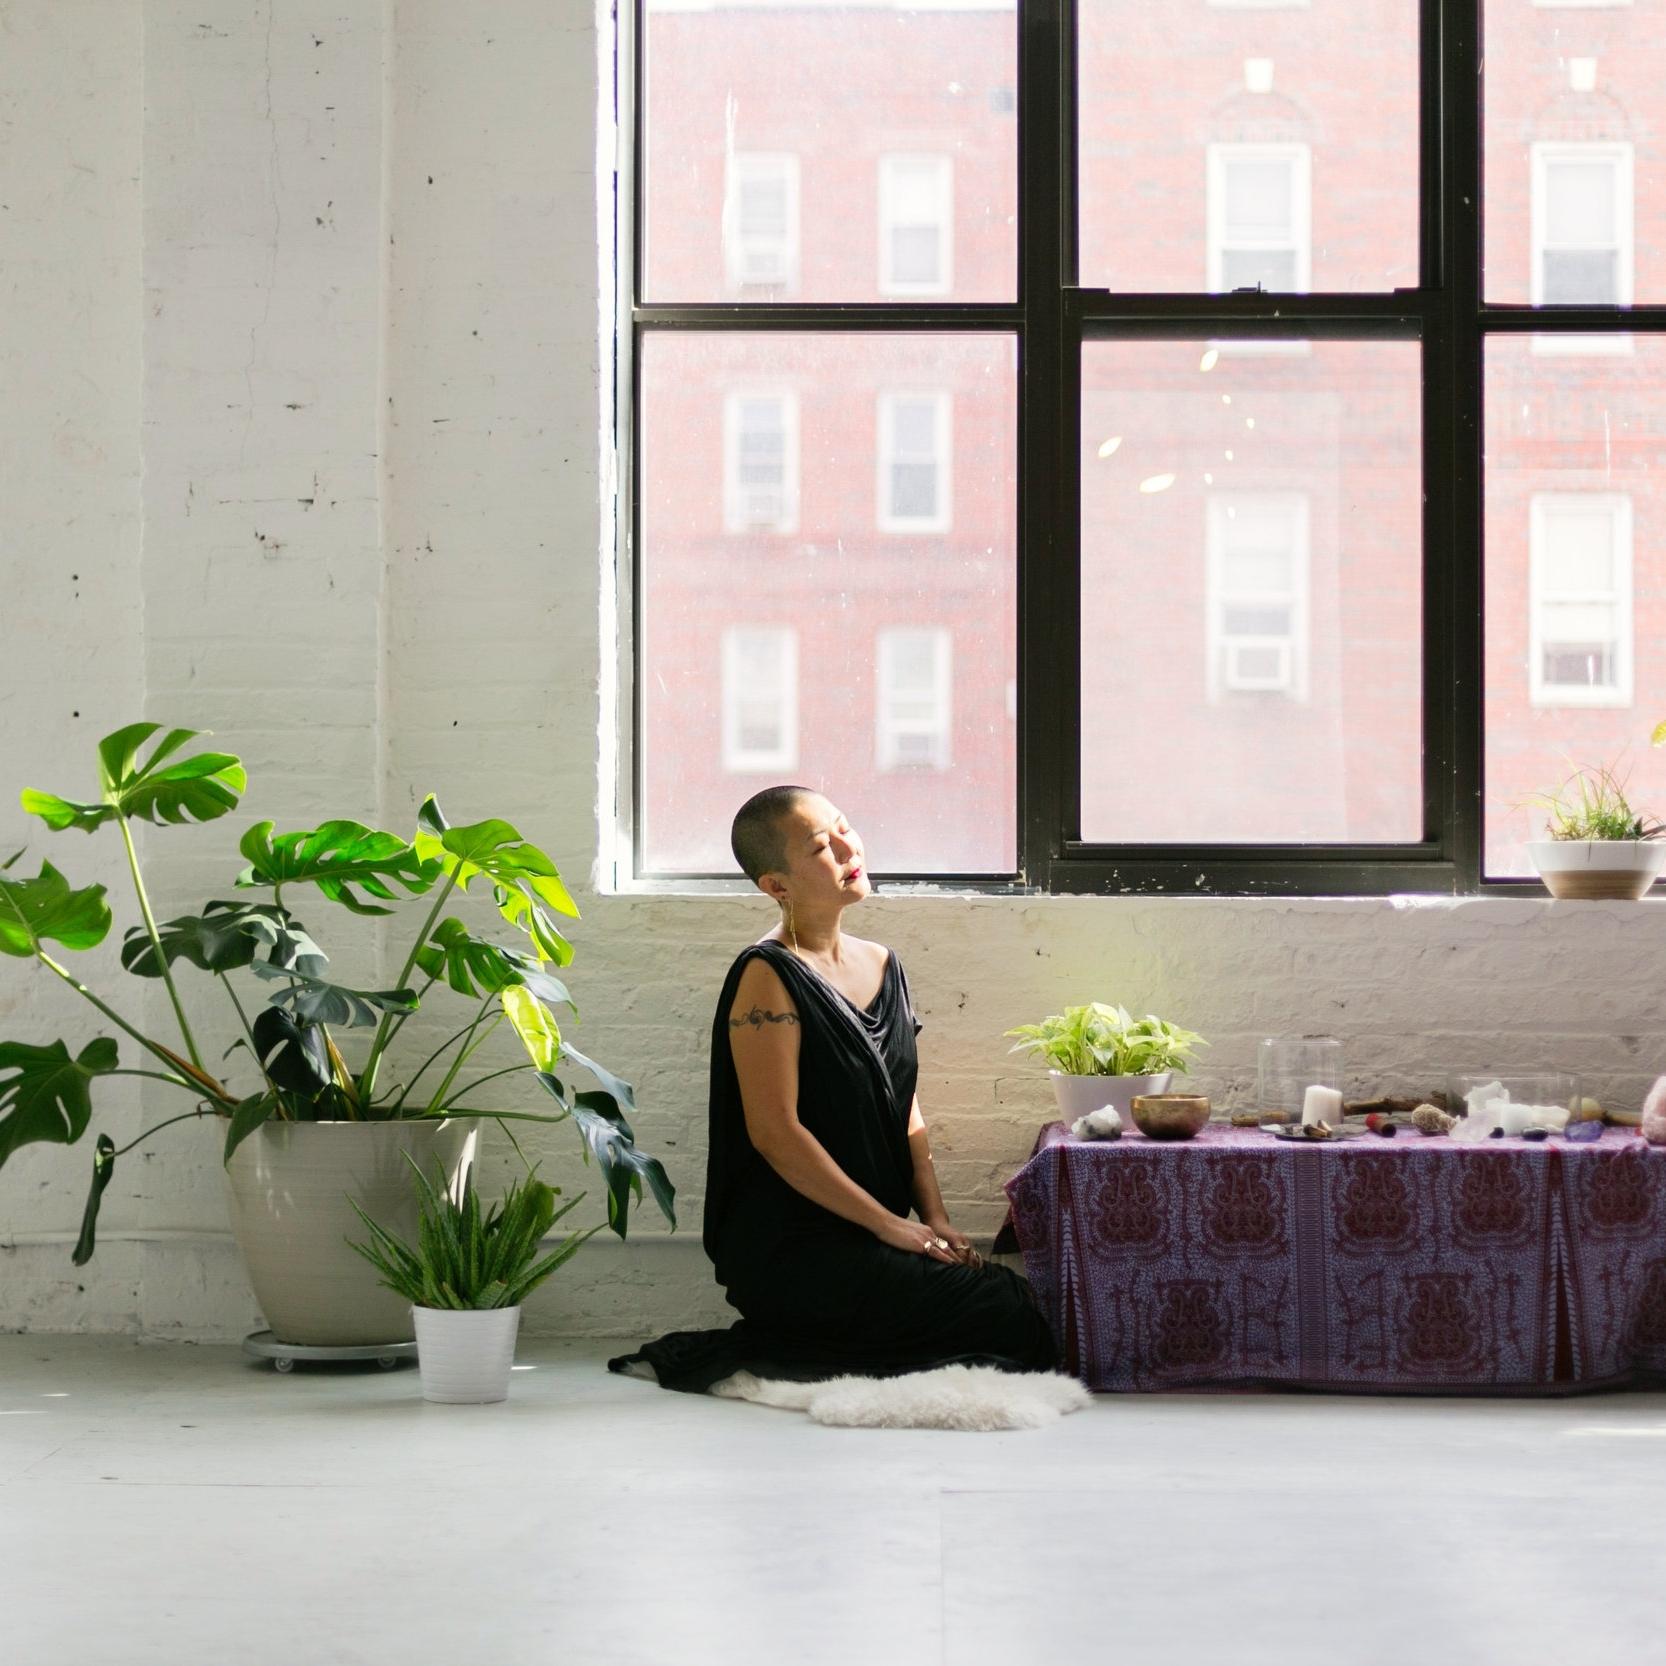 Aki Hirata Baker / Flower Essence, Reiki, Energetic Healing